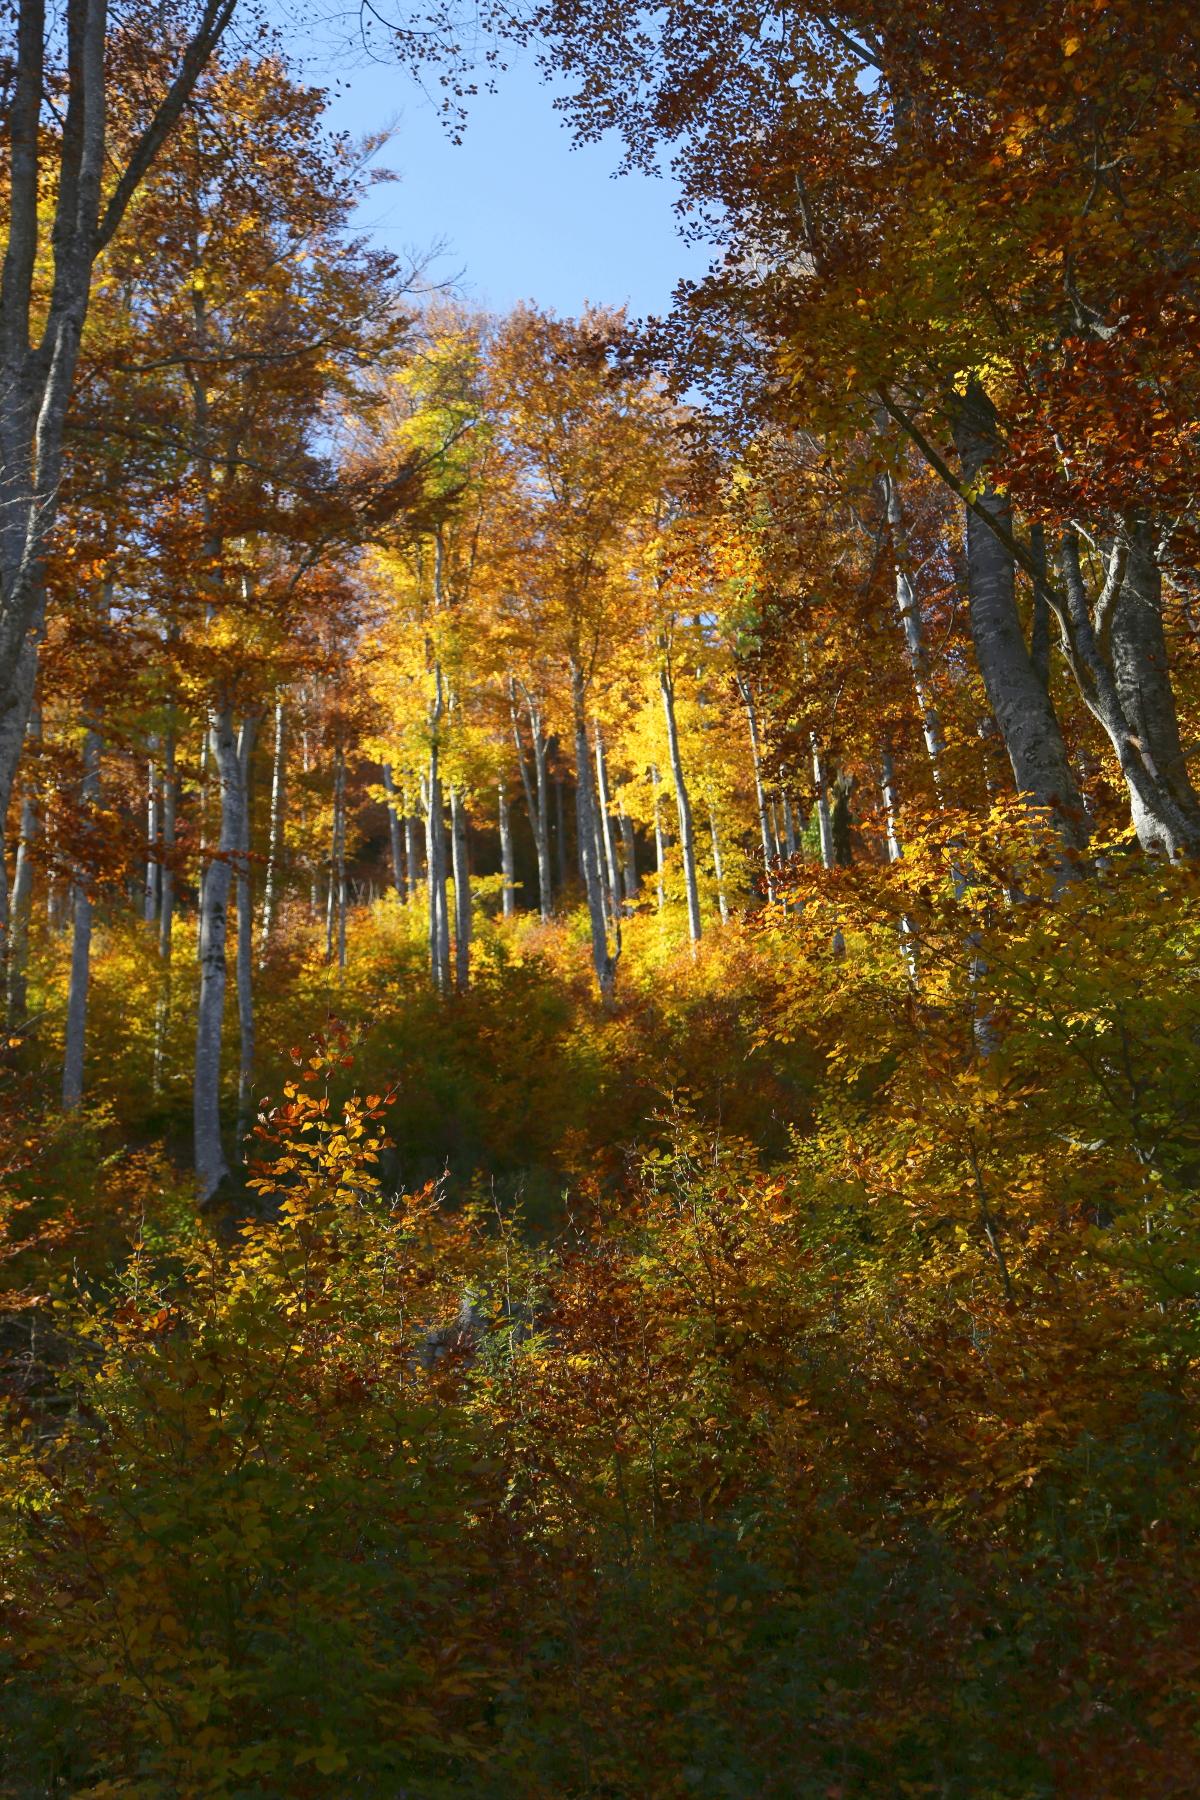 Lux en automne - Lux in autumn